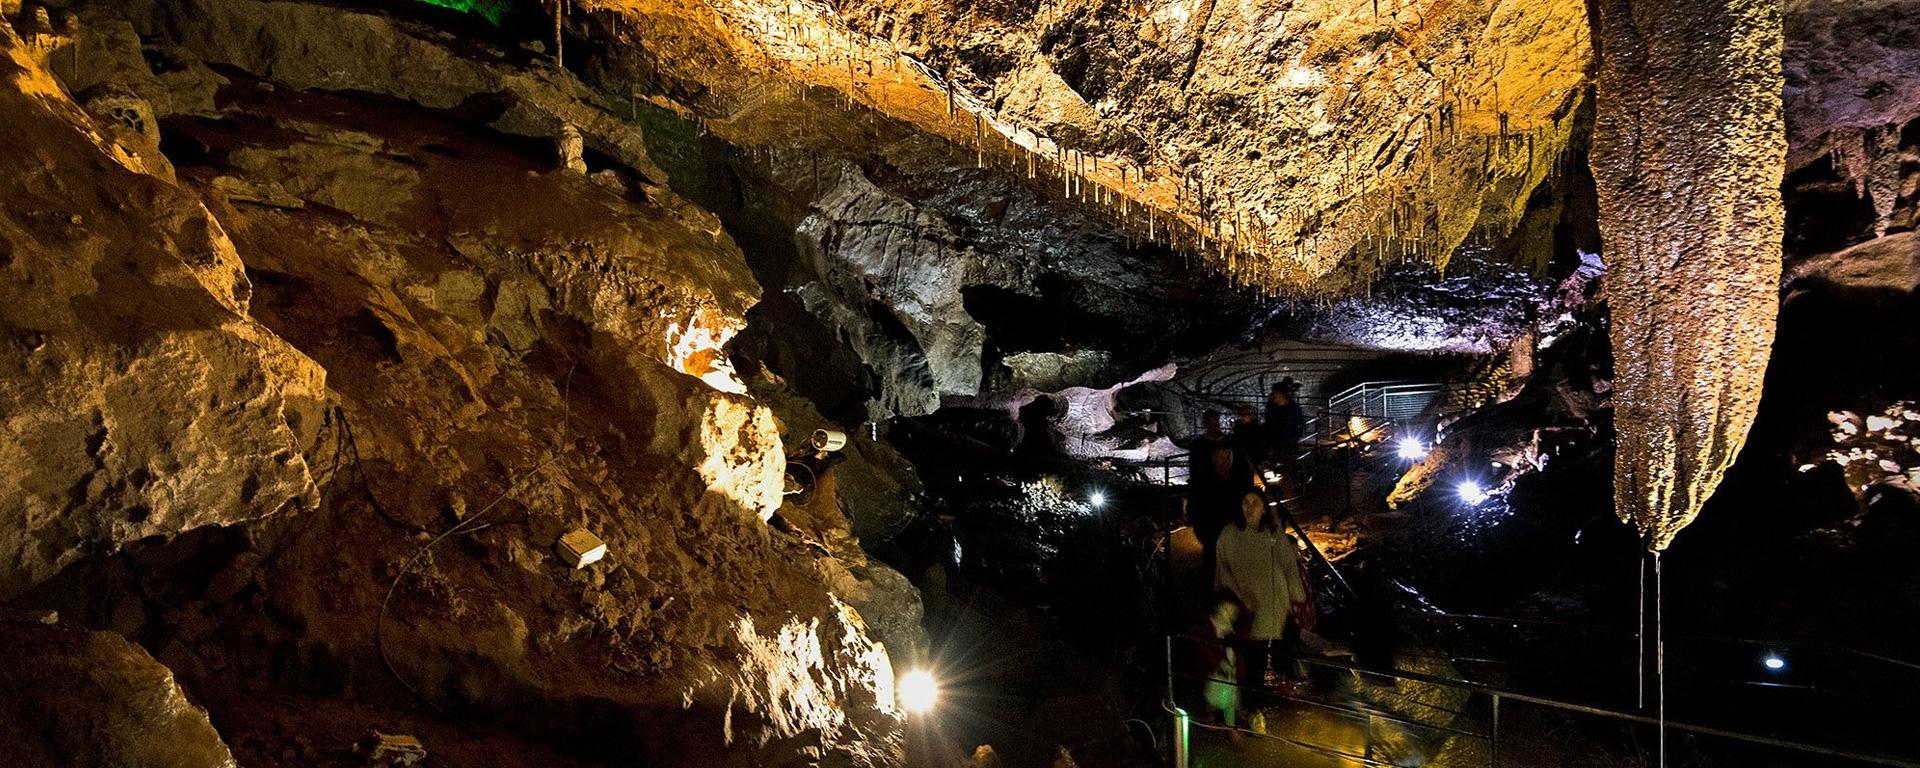 Crag Cave - Co.Kerry, Ireland